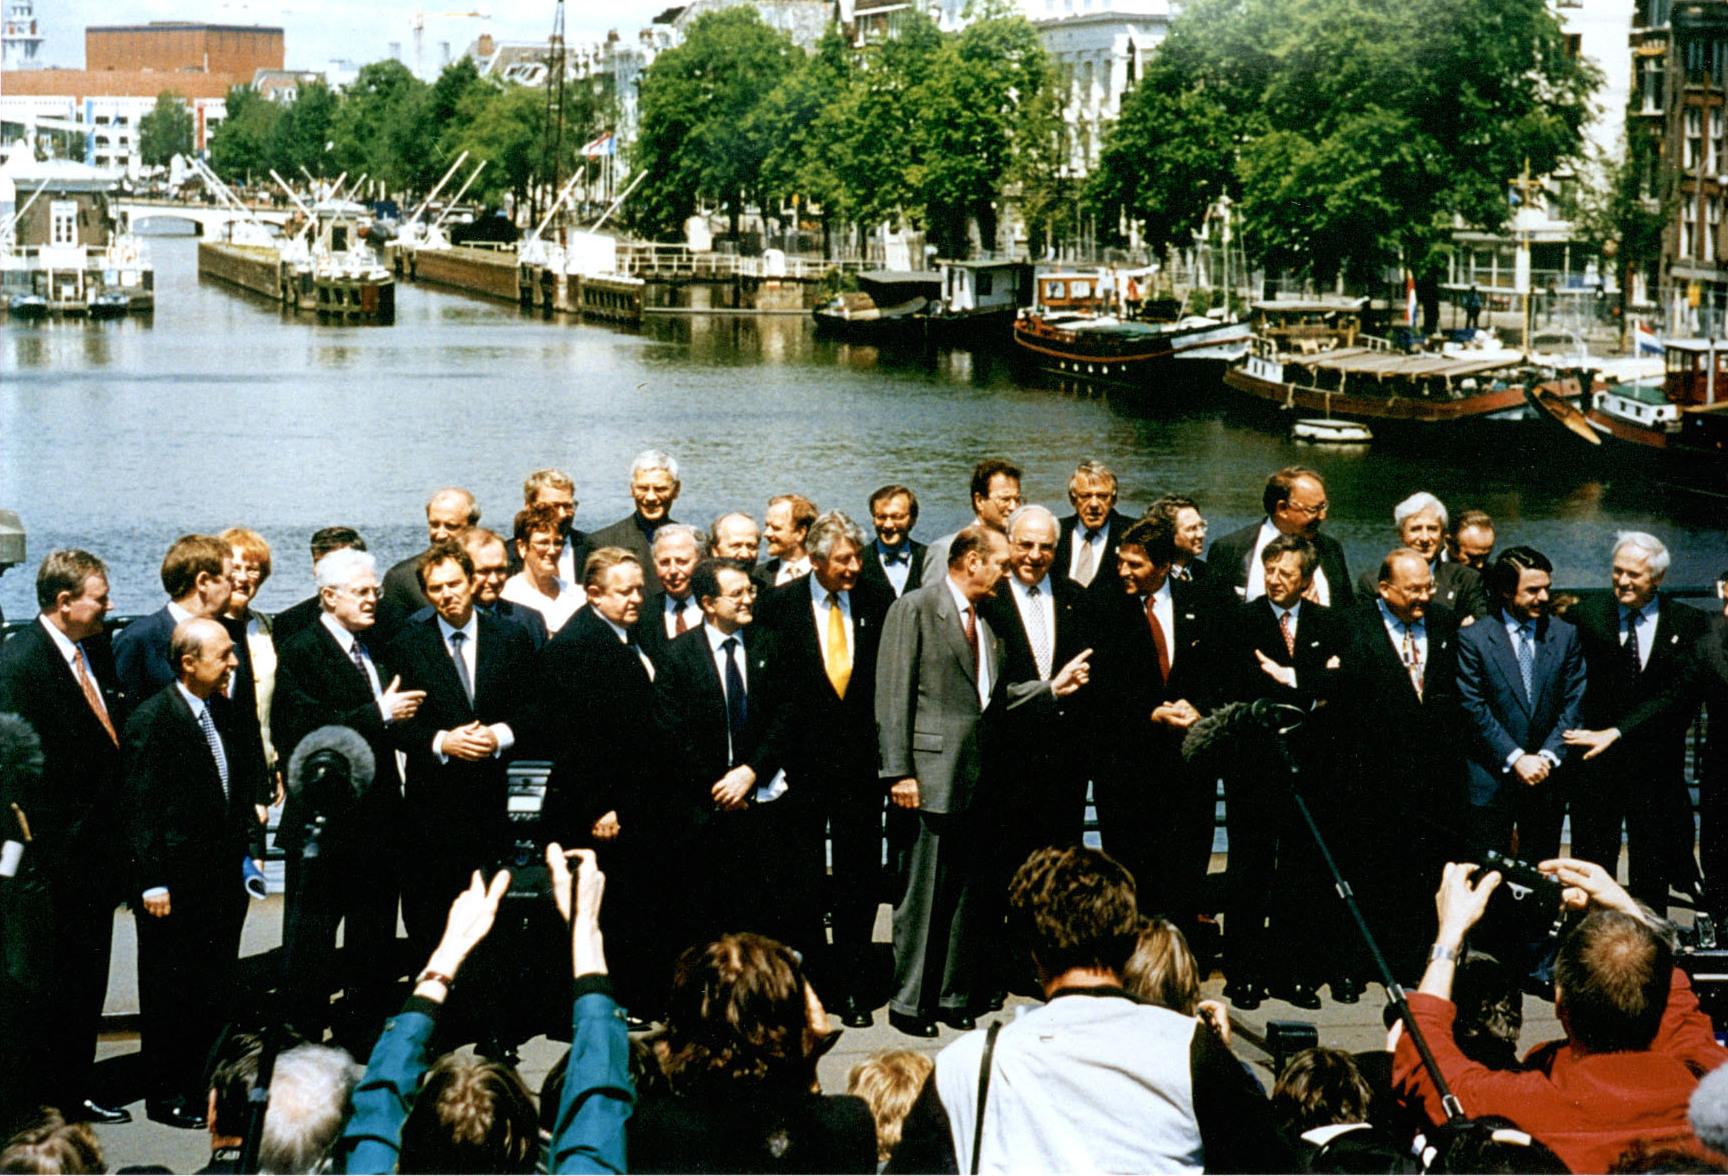 Treaty of Amsterdam